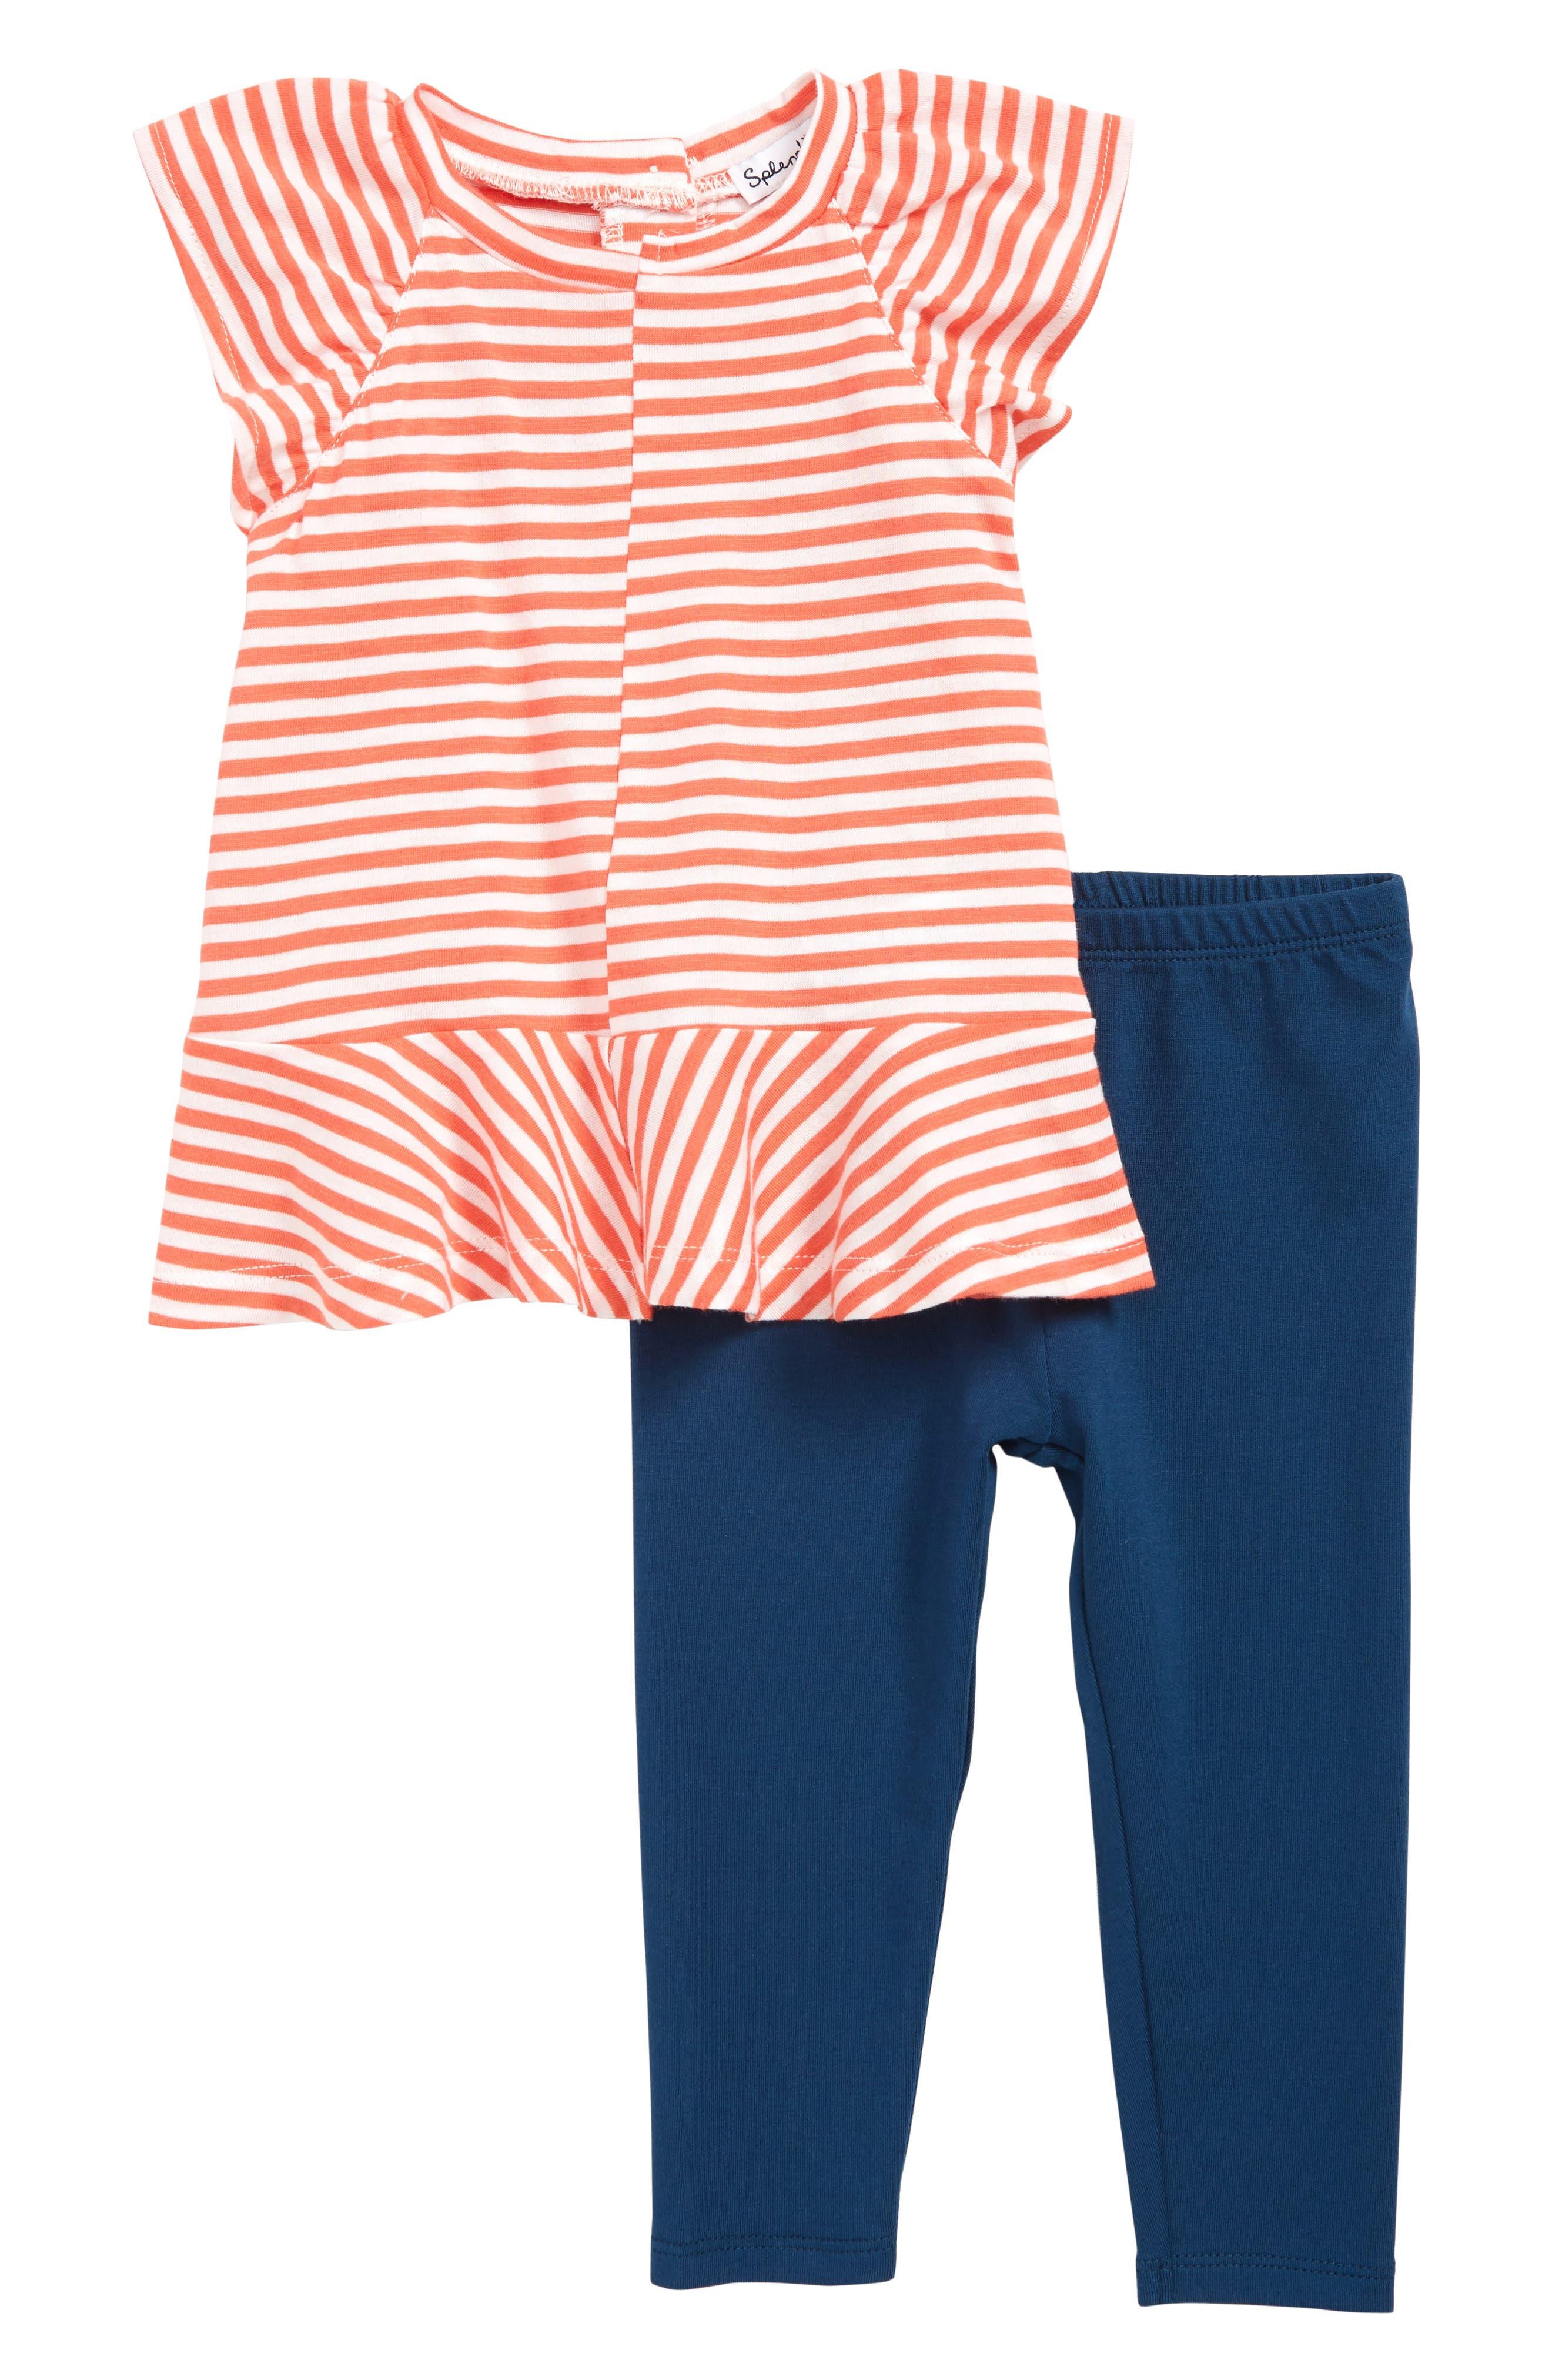 SPLENDID, Stripe Peplum T-Shirt & Leggings Set, Main thumbnail 1, color, CORAL LIPSTICK